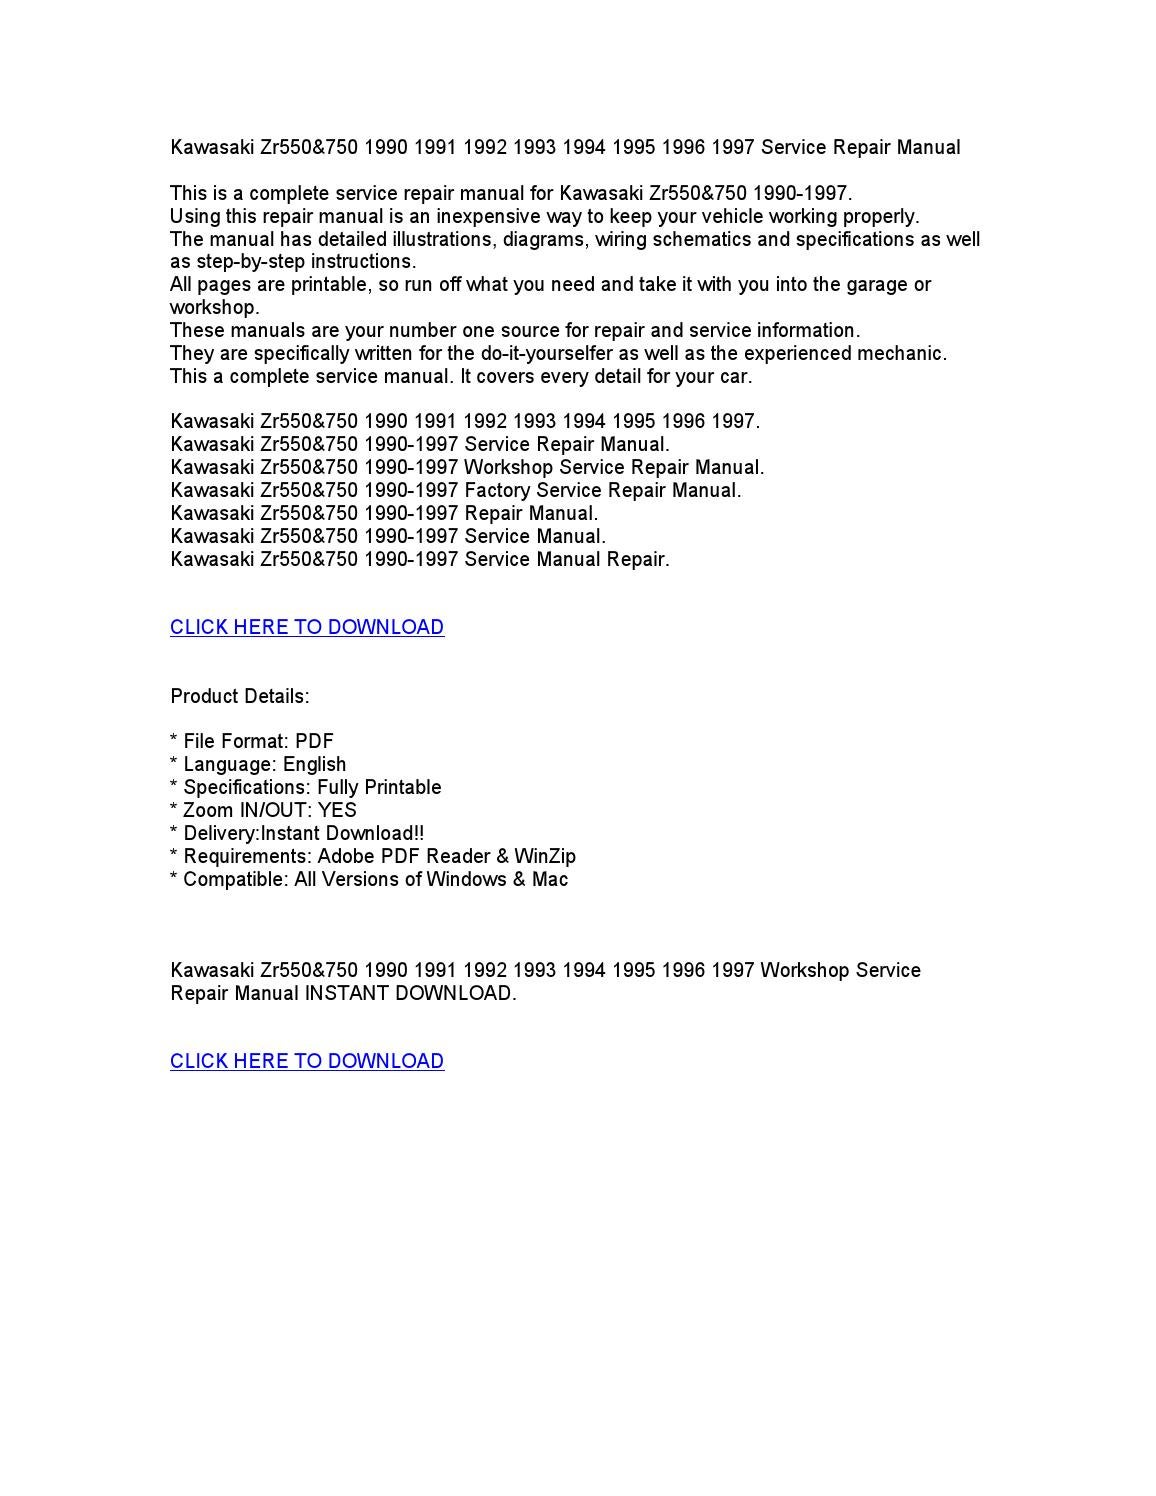 Zr 550 Service Manual